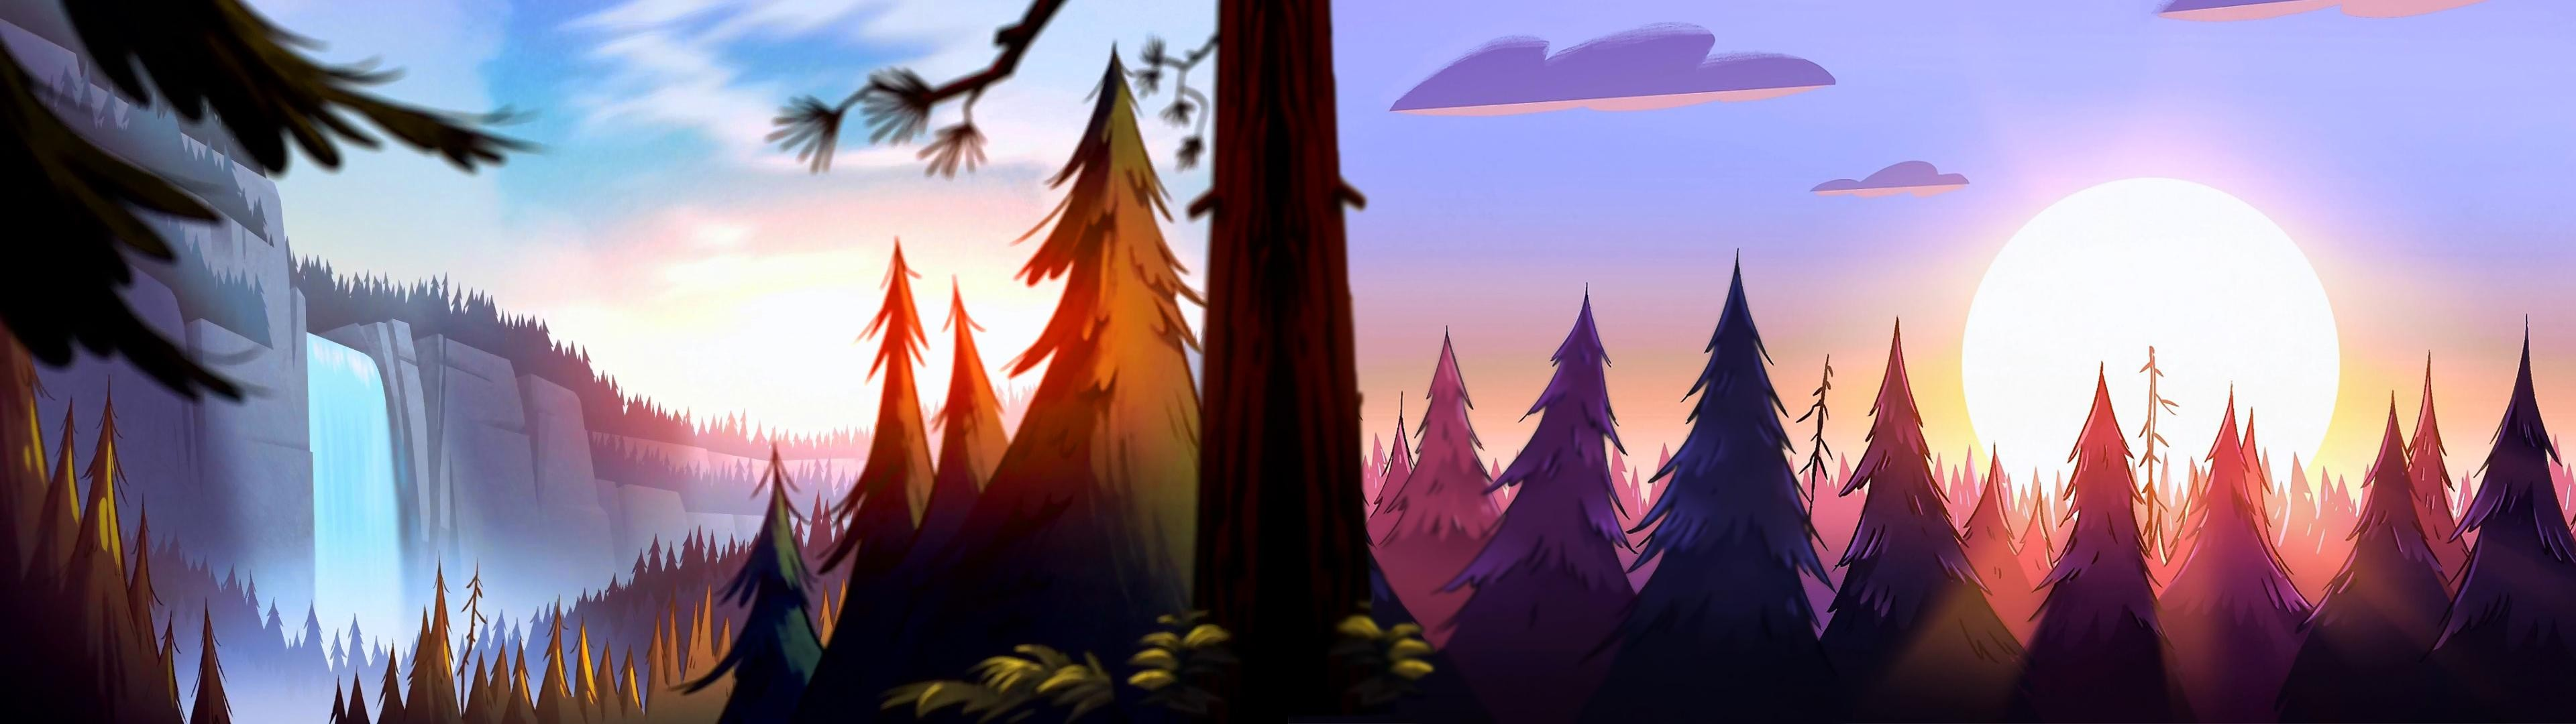 Fall Dual Monitor Wallpaper Gravity Falls Wallpaper 183 ① Download Free Cool Wallpapers